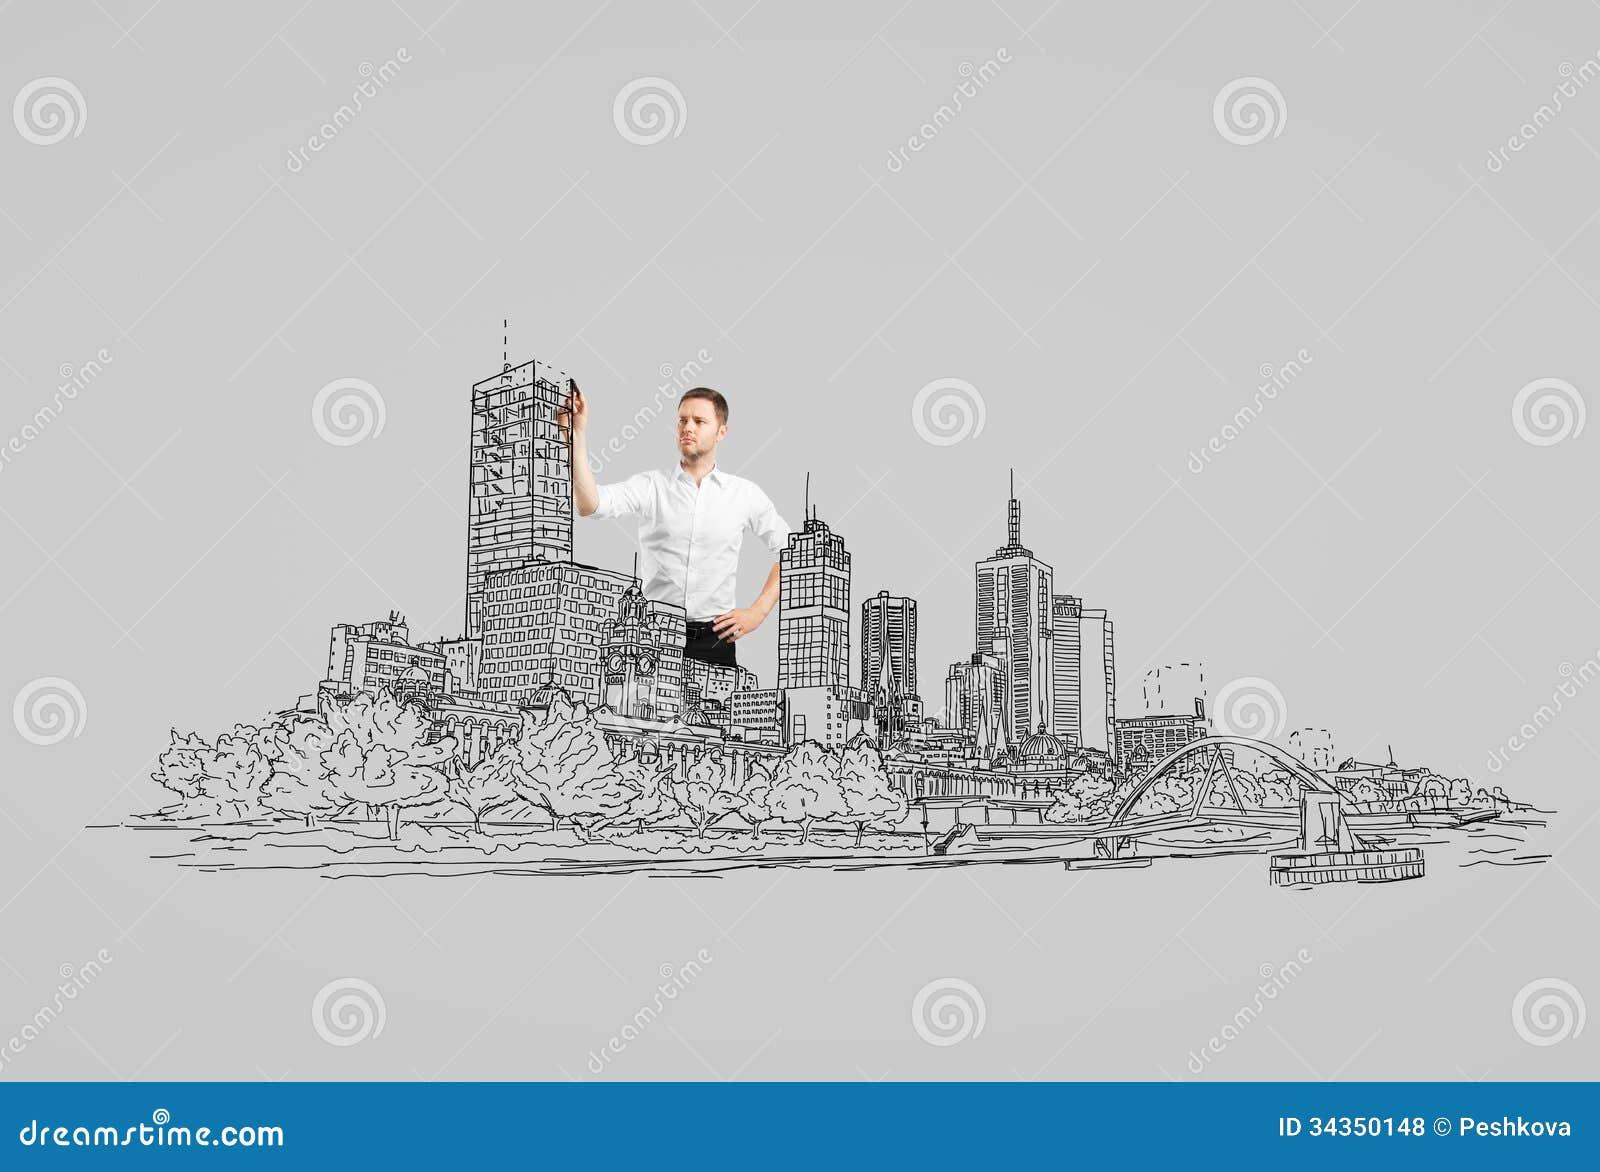 drawing abstract city royalty free stock photos